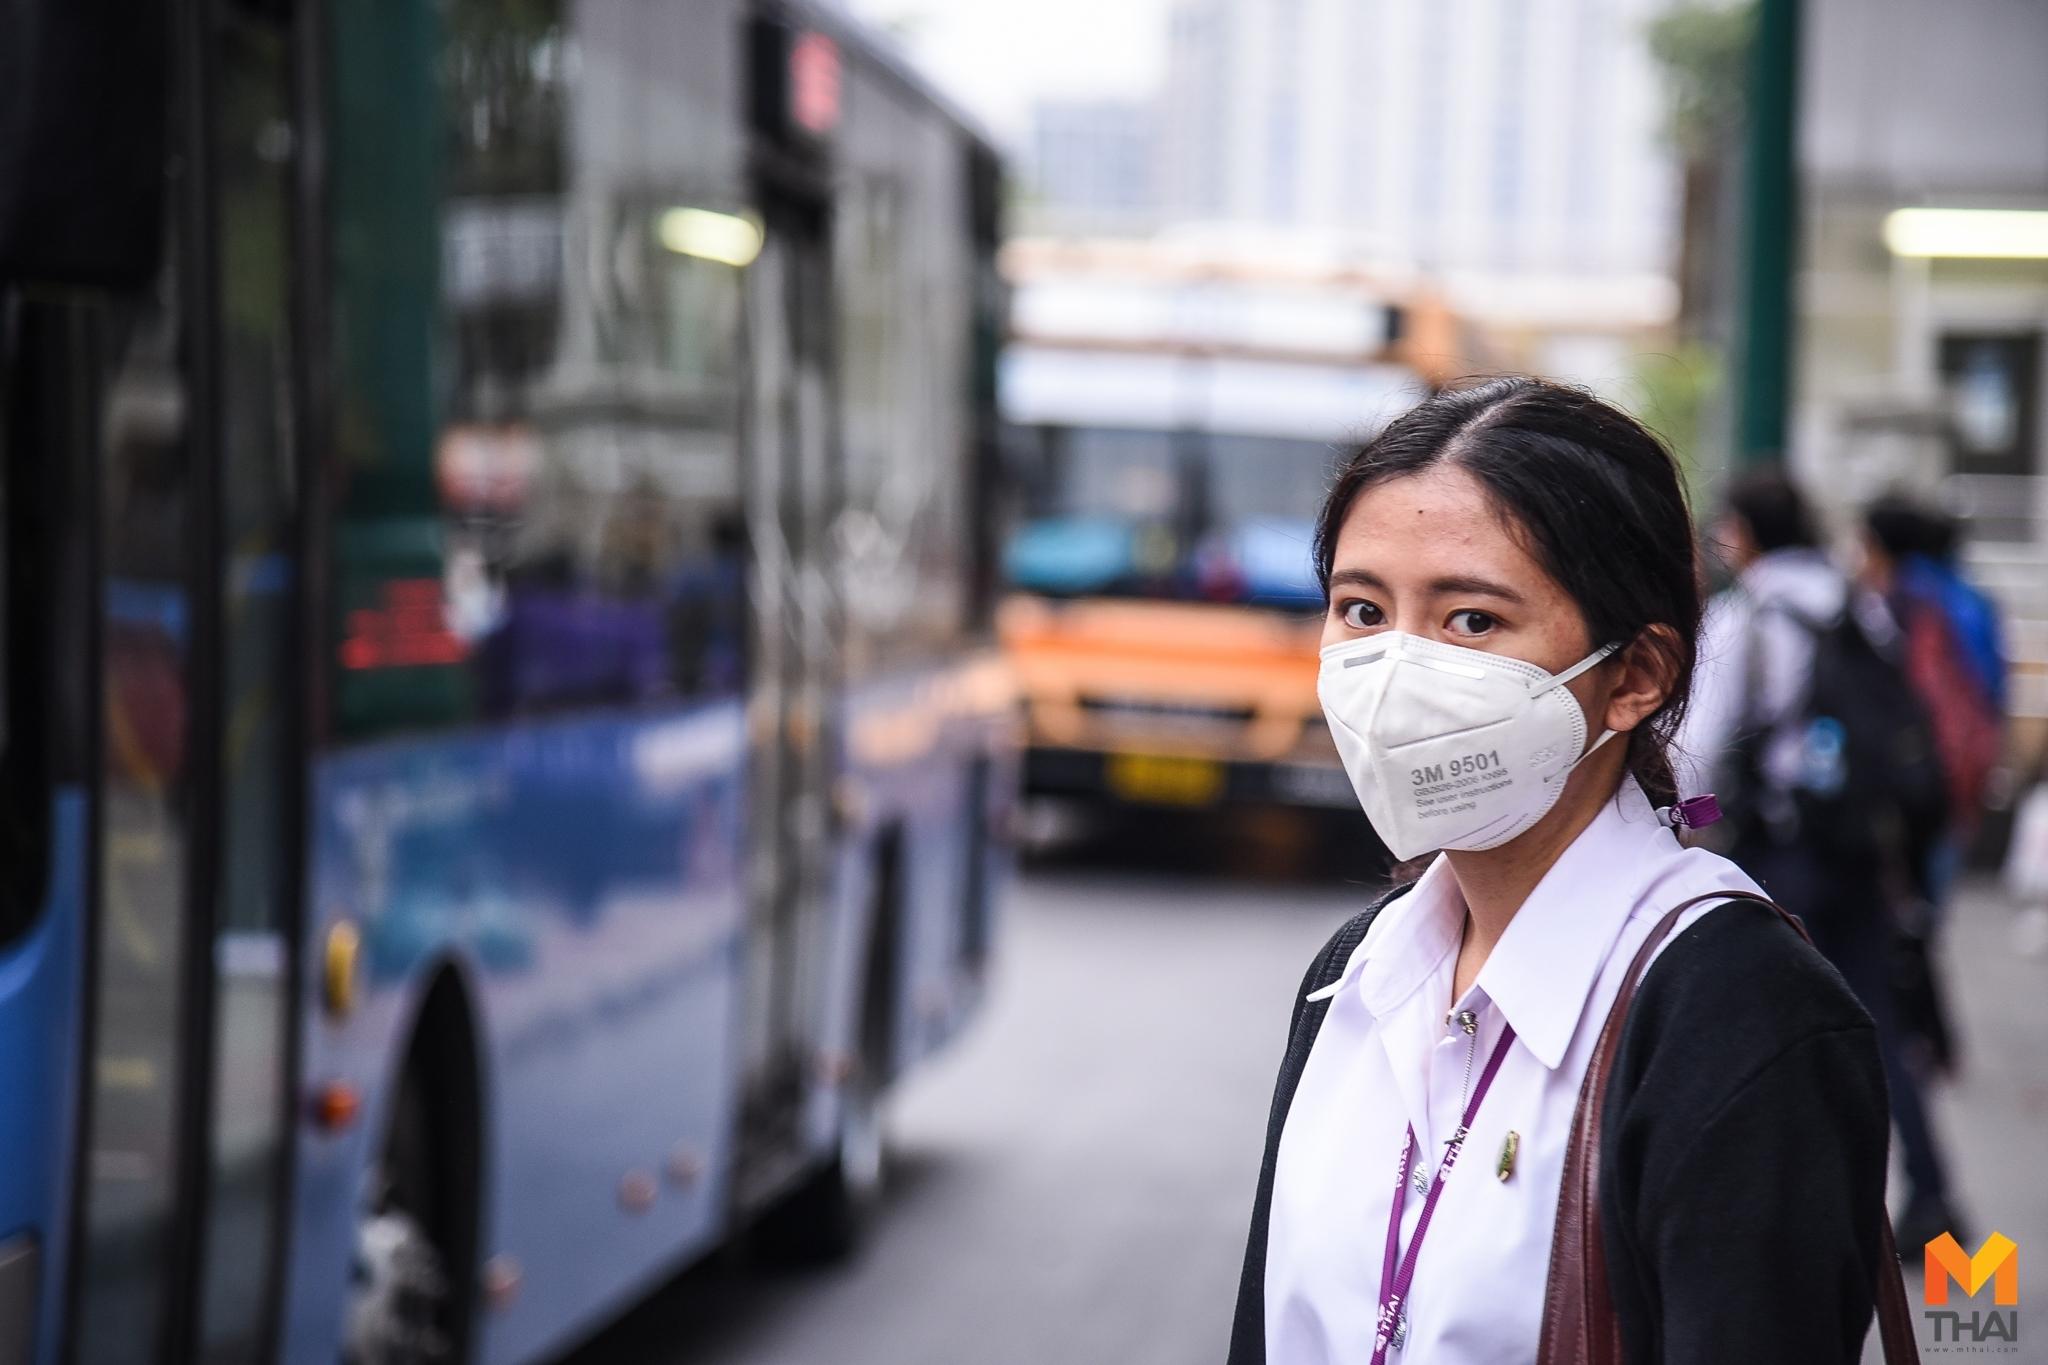 PM2.5 ข่าวสดวันนี้ หน้ากาก N95